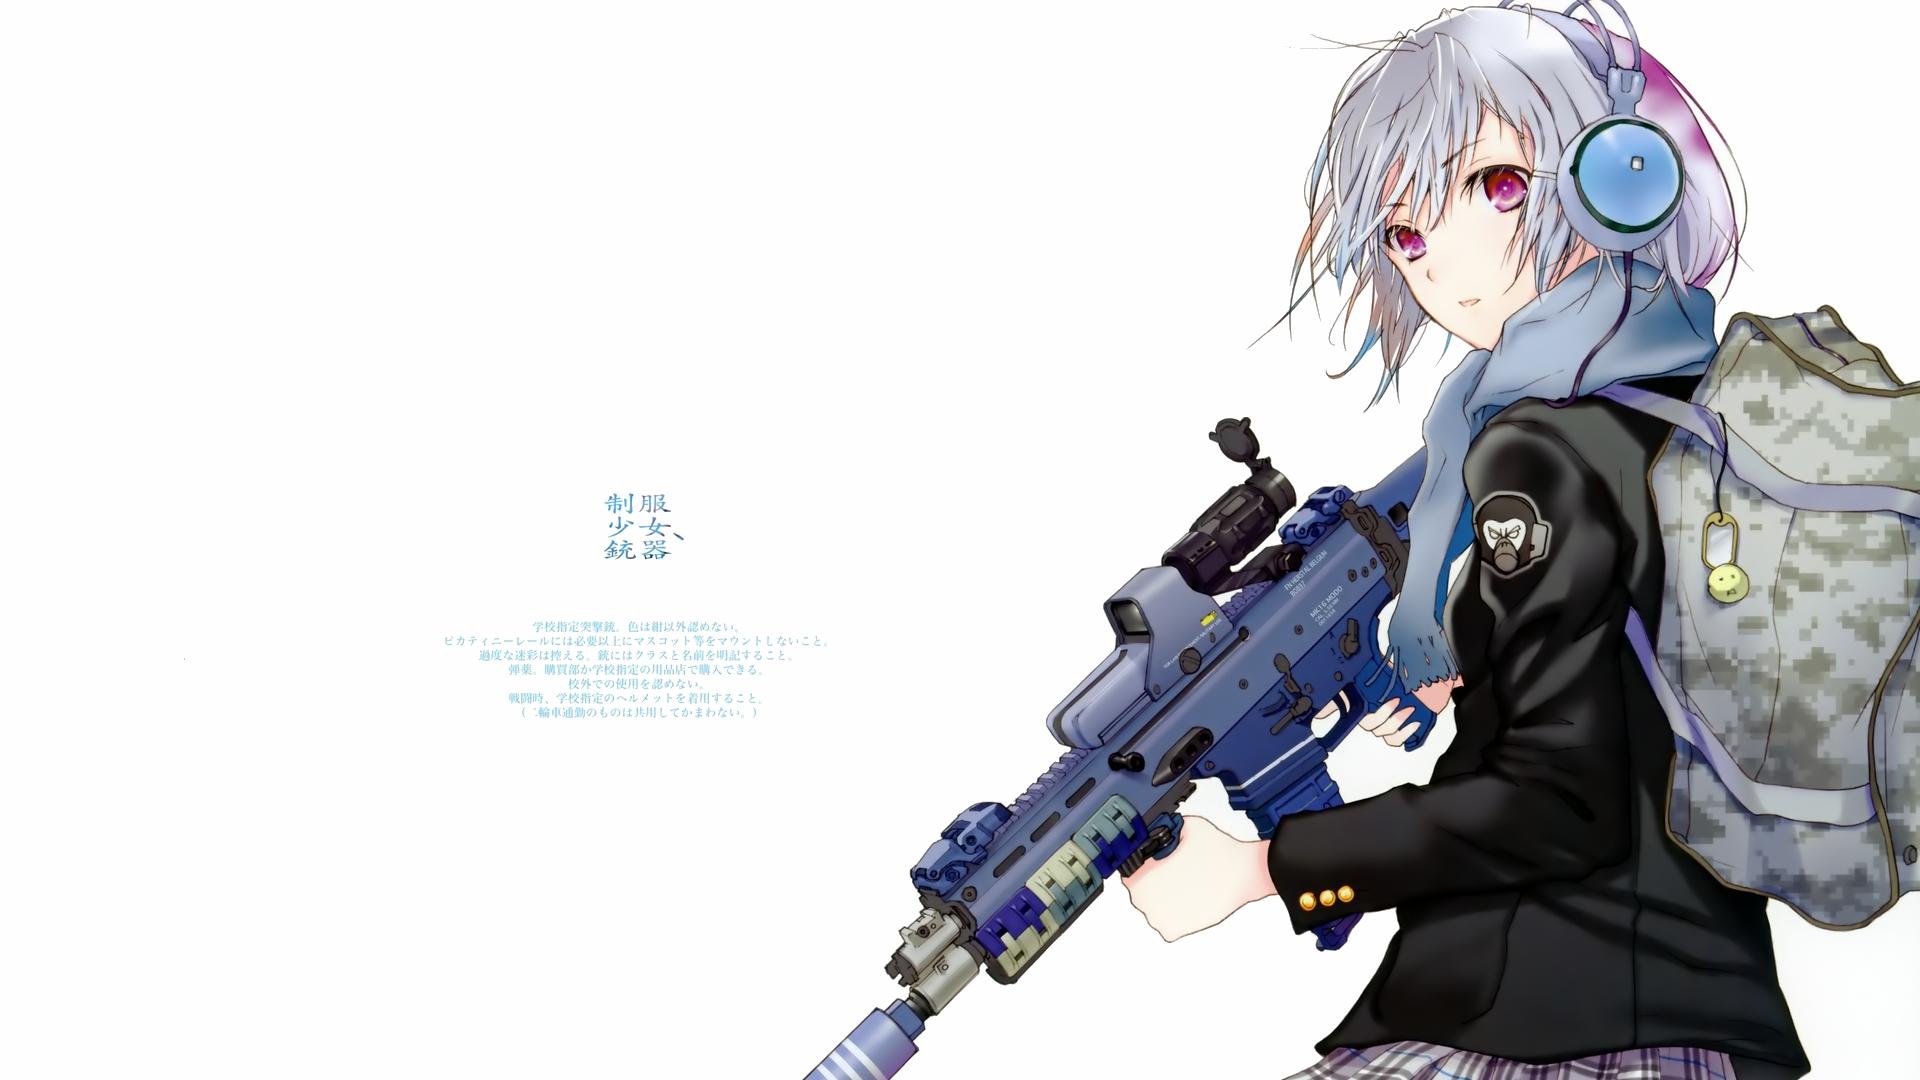 Anime Girls With Guns HD Wallpaper | 1920x1080 | ID:22691